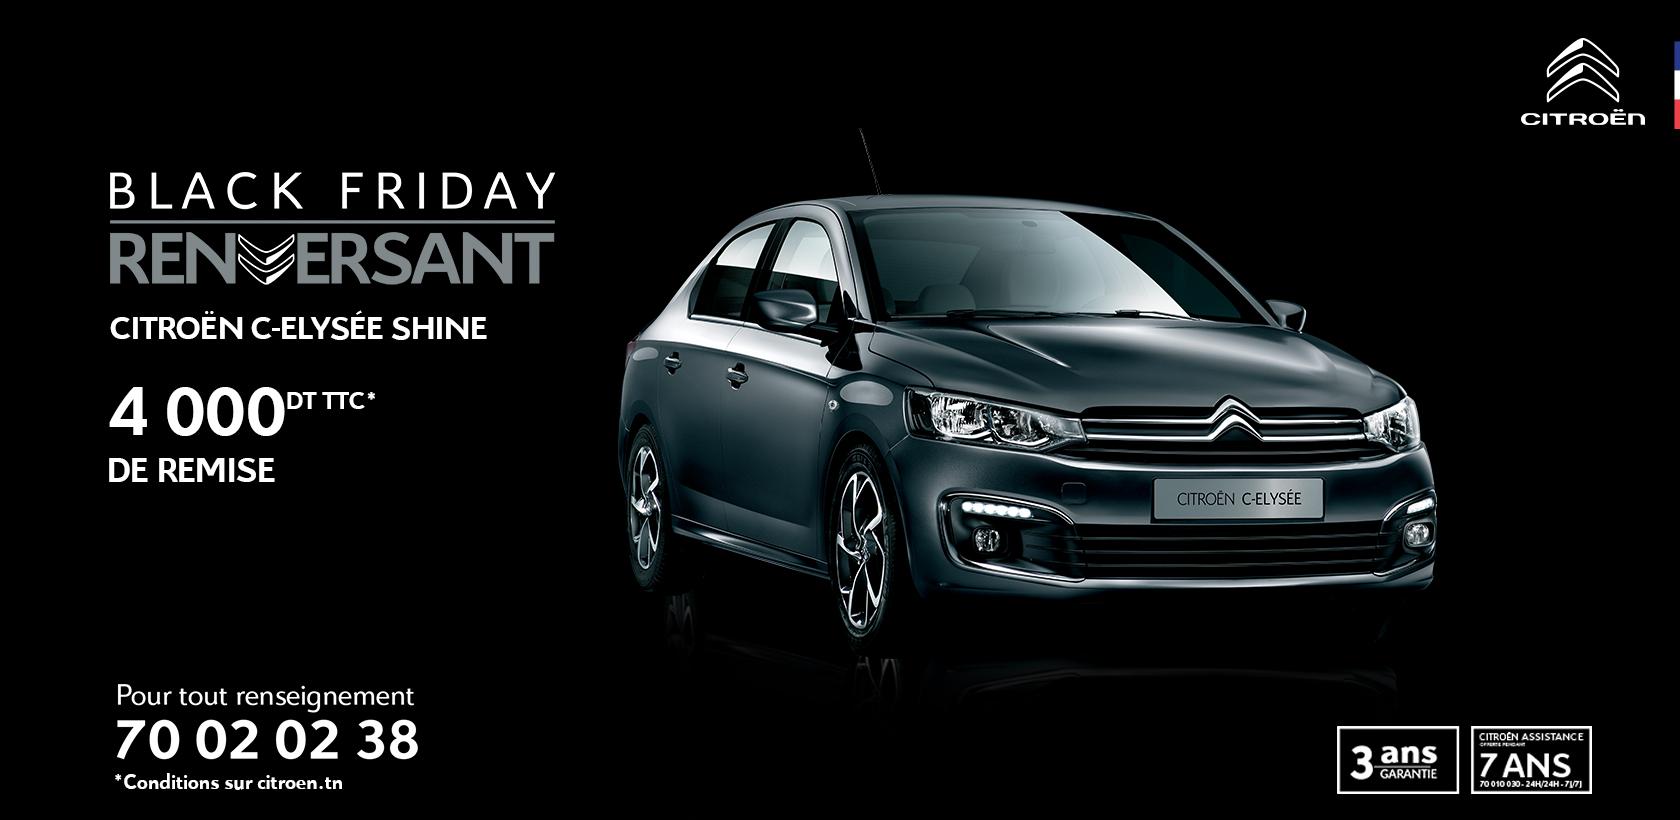 Black Friday chez Citroën